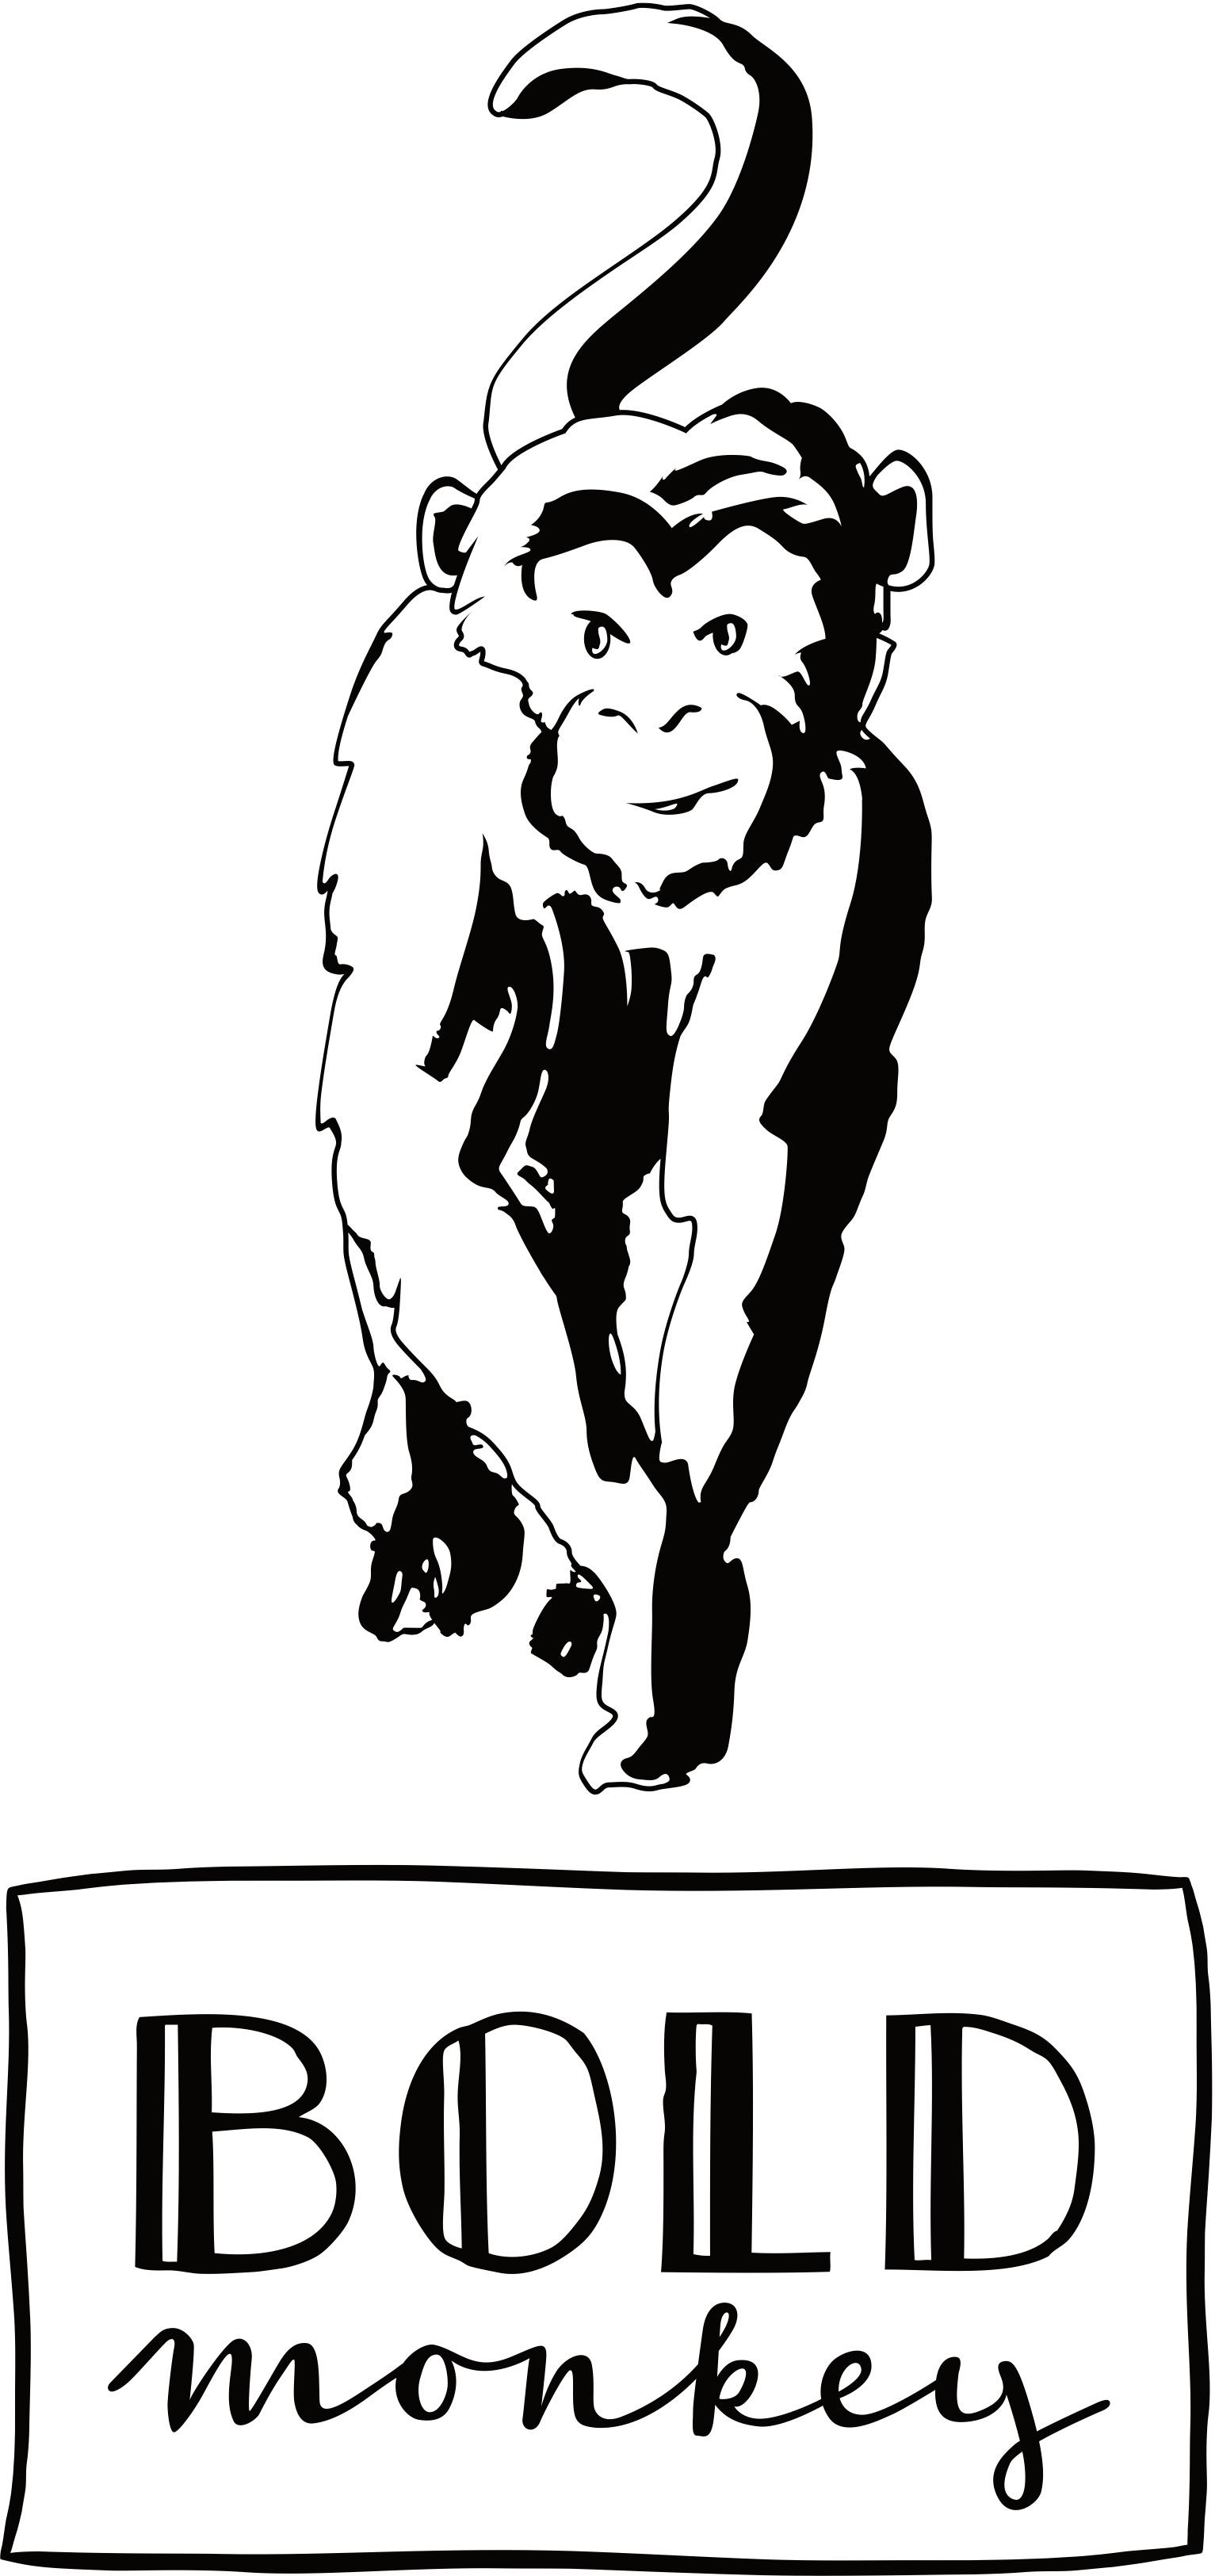 Bold Monkey i am not a macaron lage barkruk counter kookeiland kruk velvet blauw gouden poten vooraanzicht